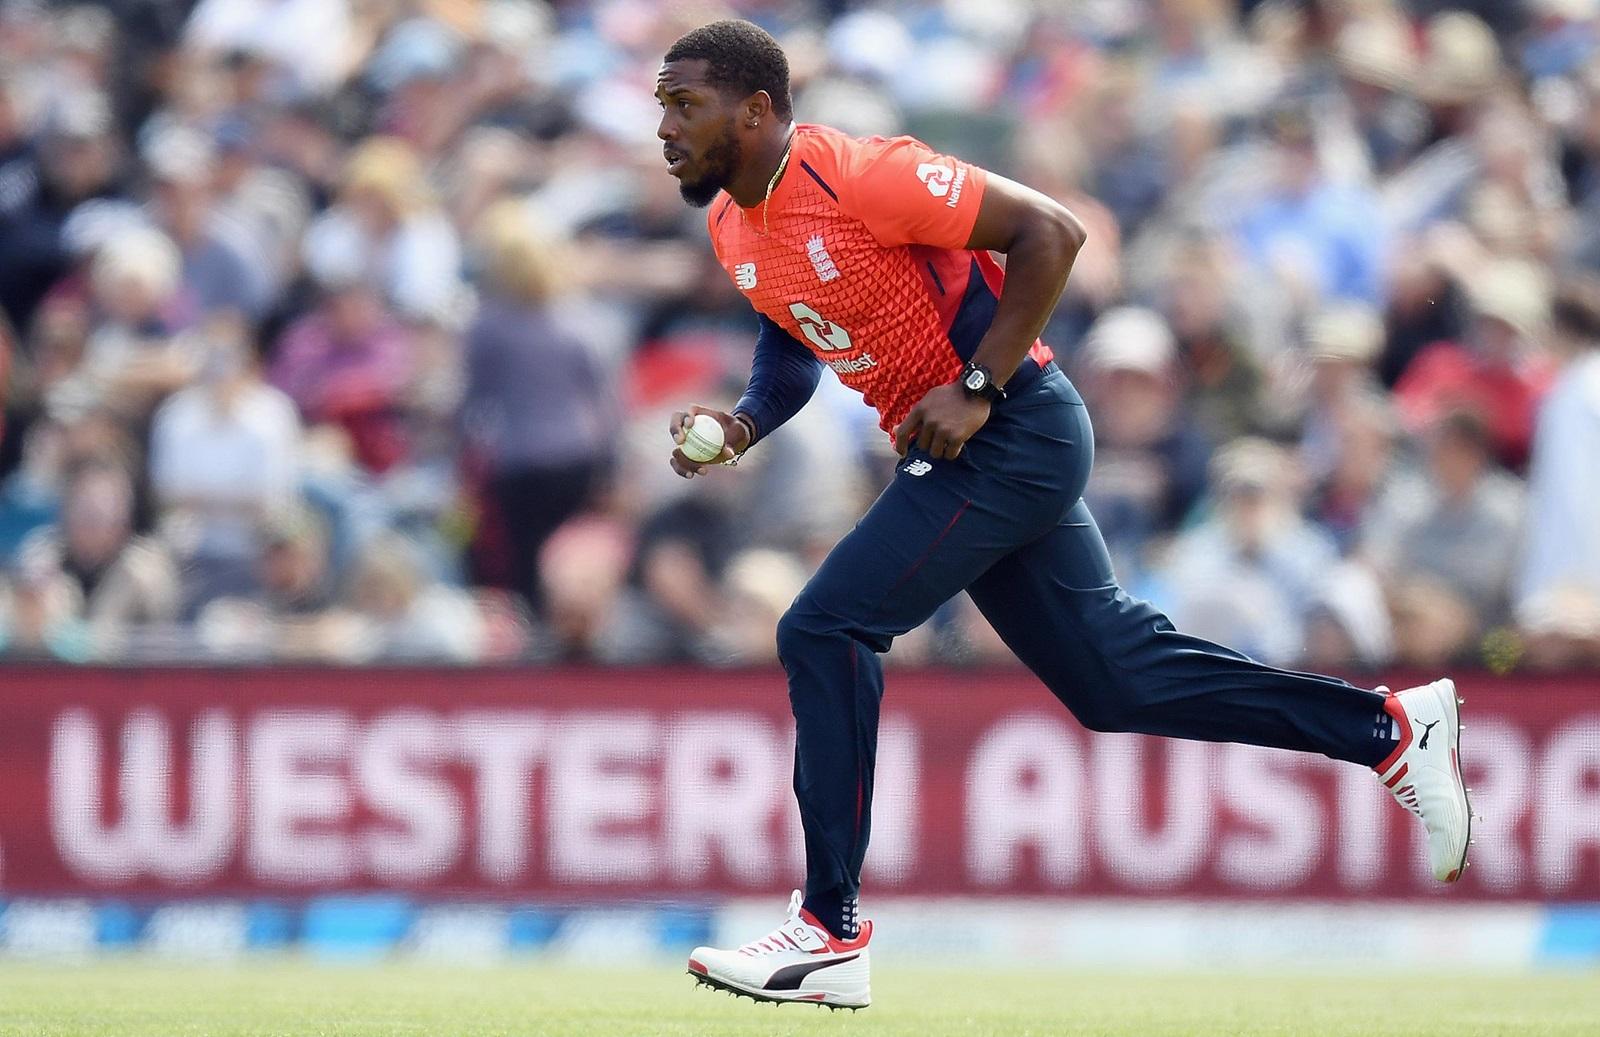 Scorchers snare Jordan to complete BBL|09 roster | cricket.com.au